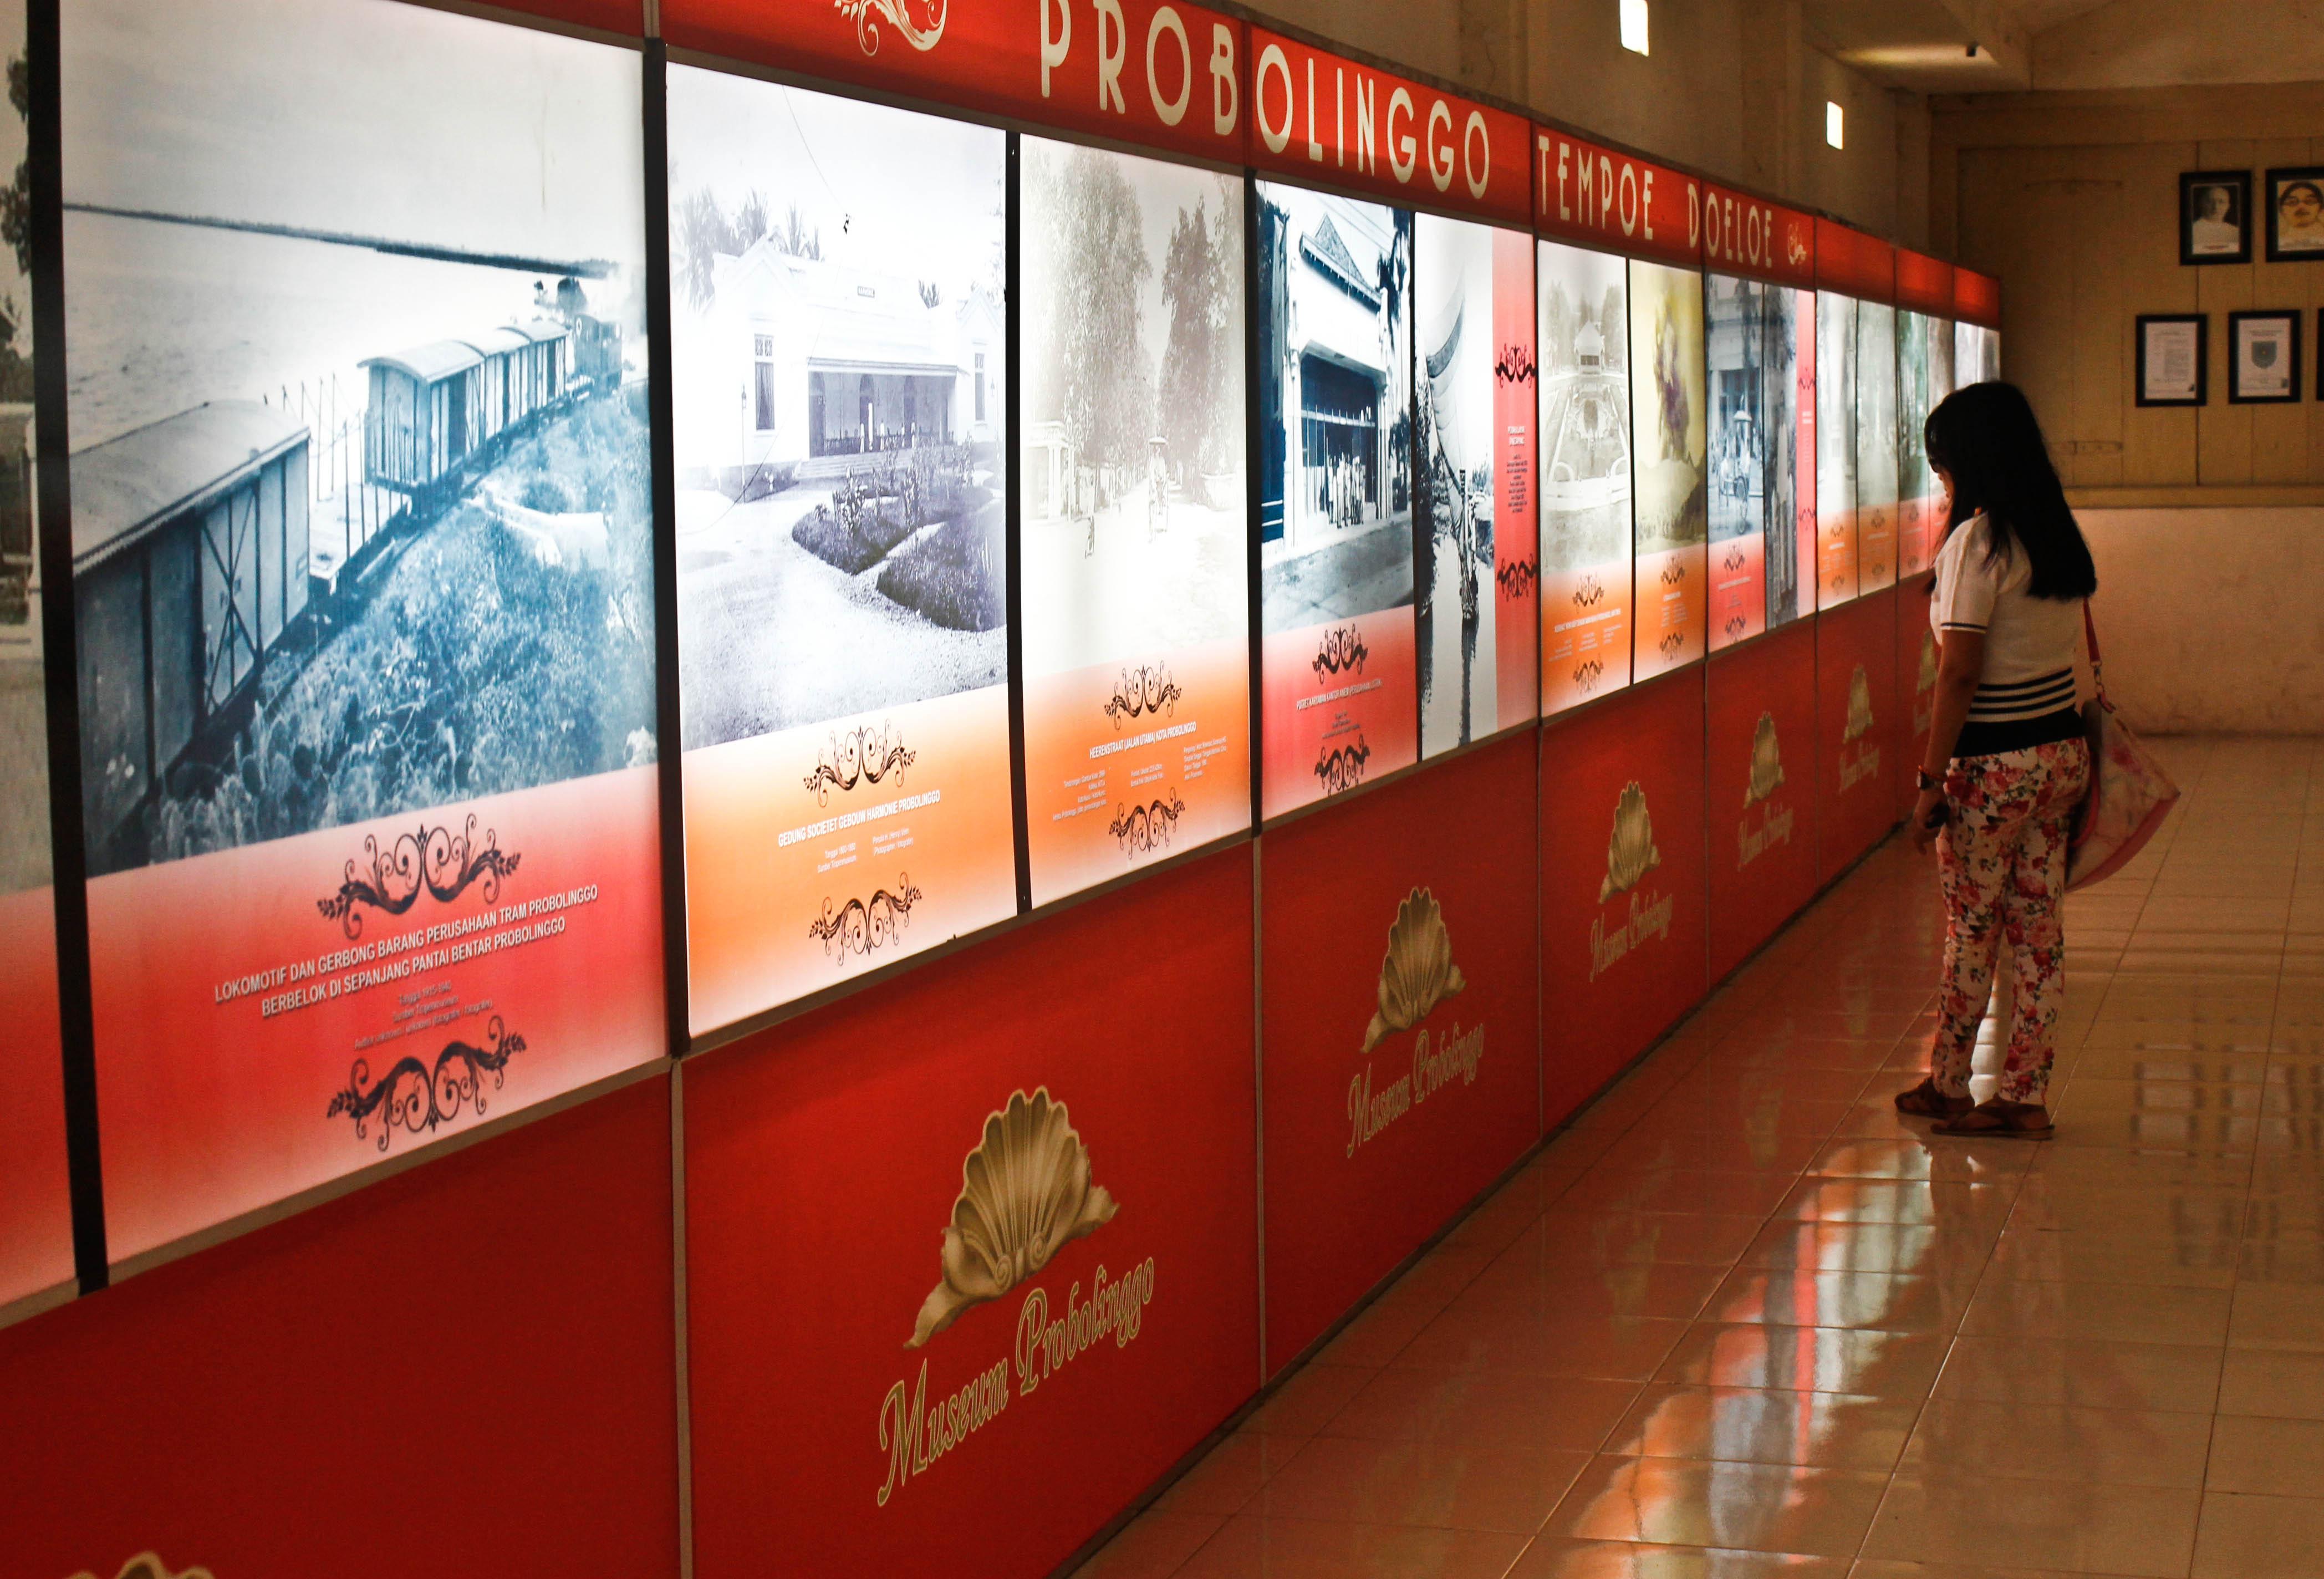 Museum Kota Probolinggo Monochromatic Conservative Rebel Gambar Suasana Tempo Dulu